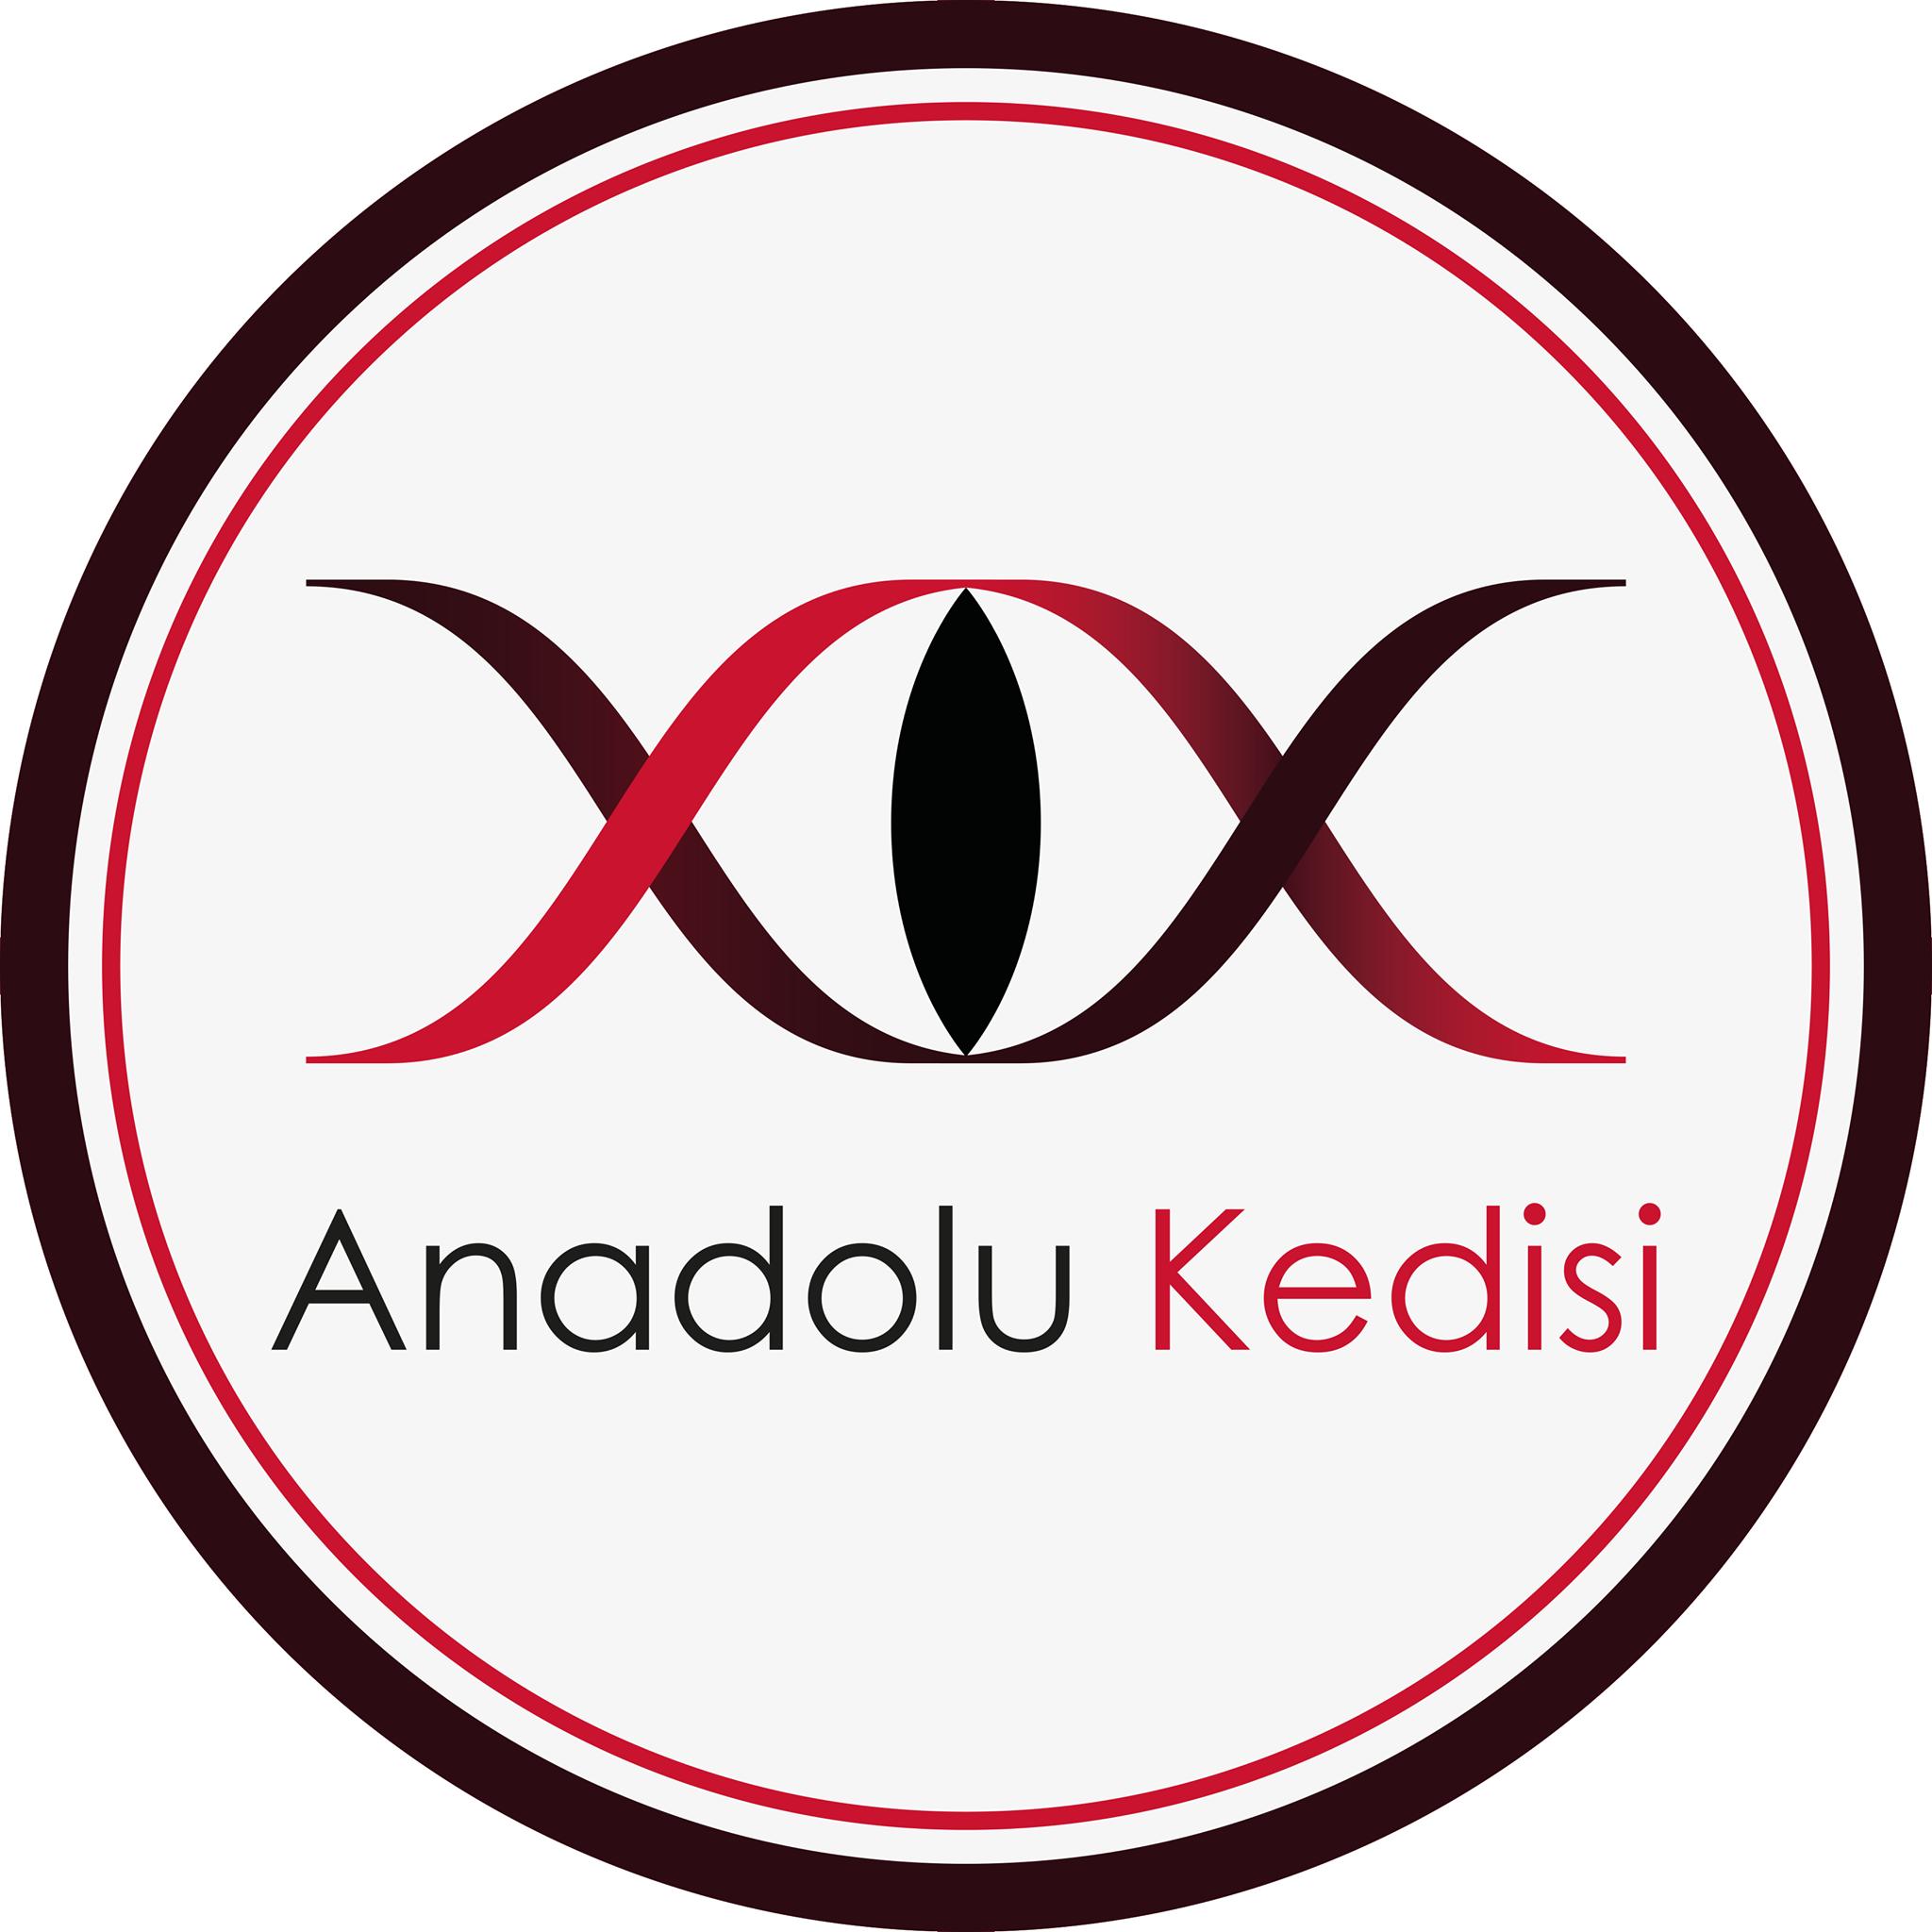 Avatar - Anadolu Kedisi